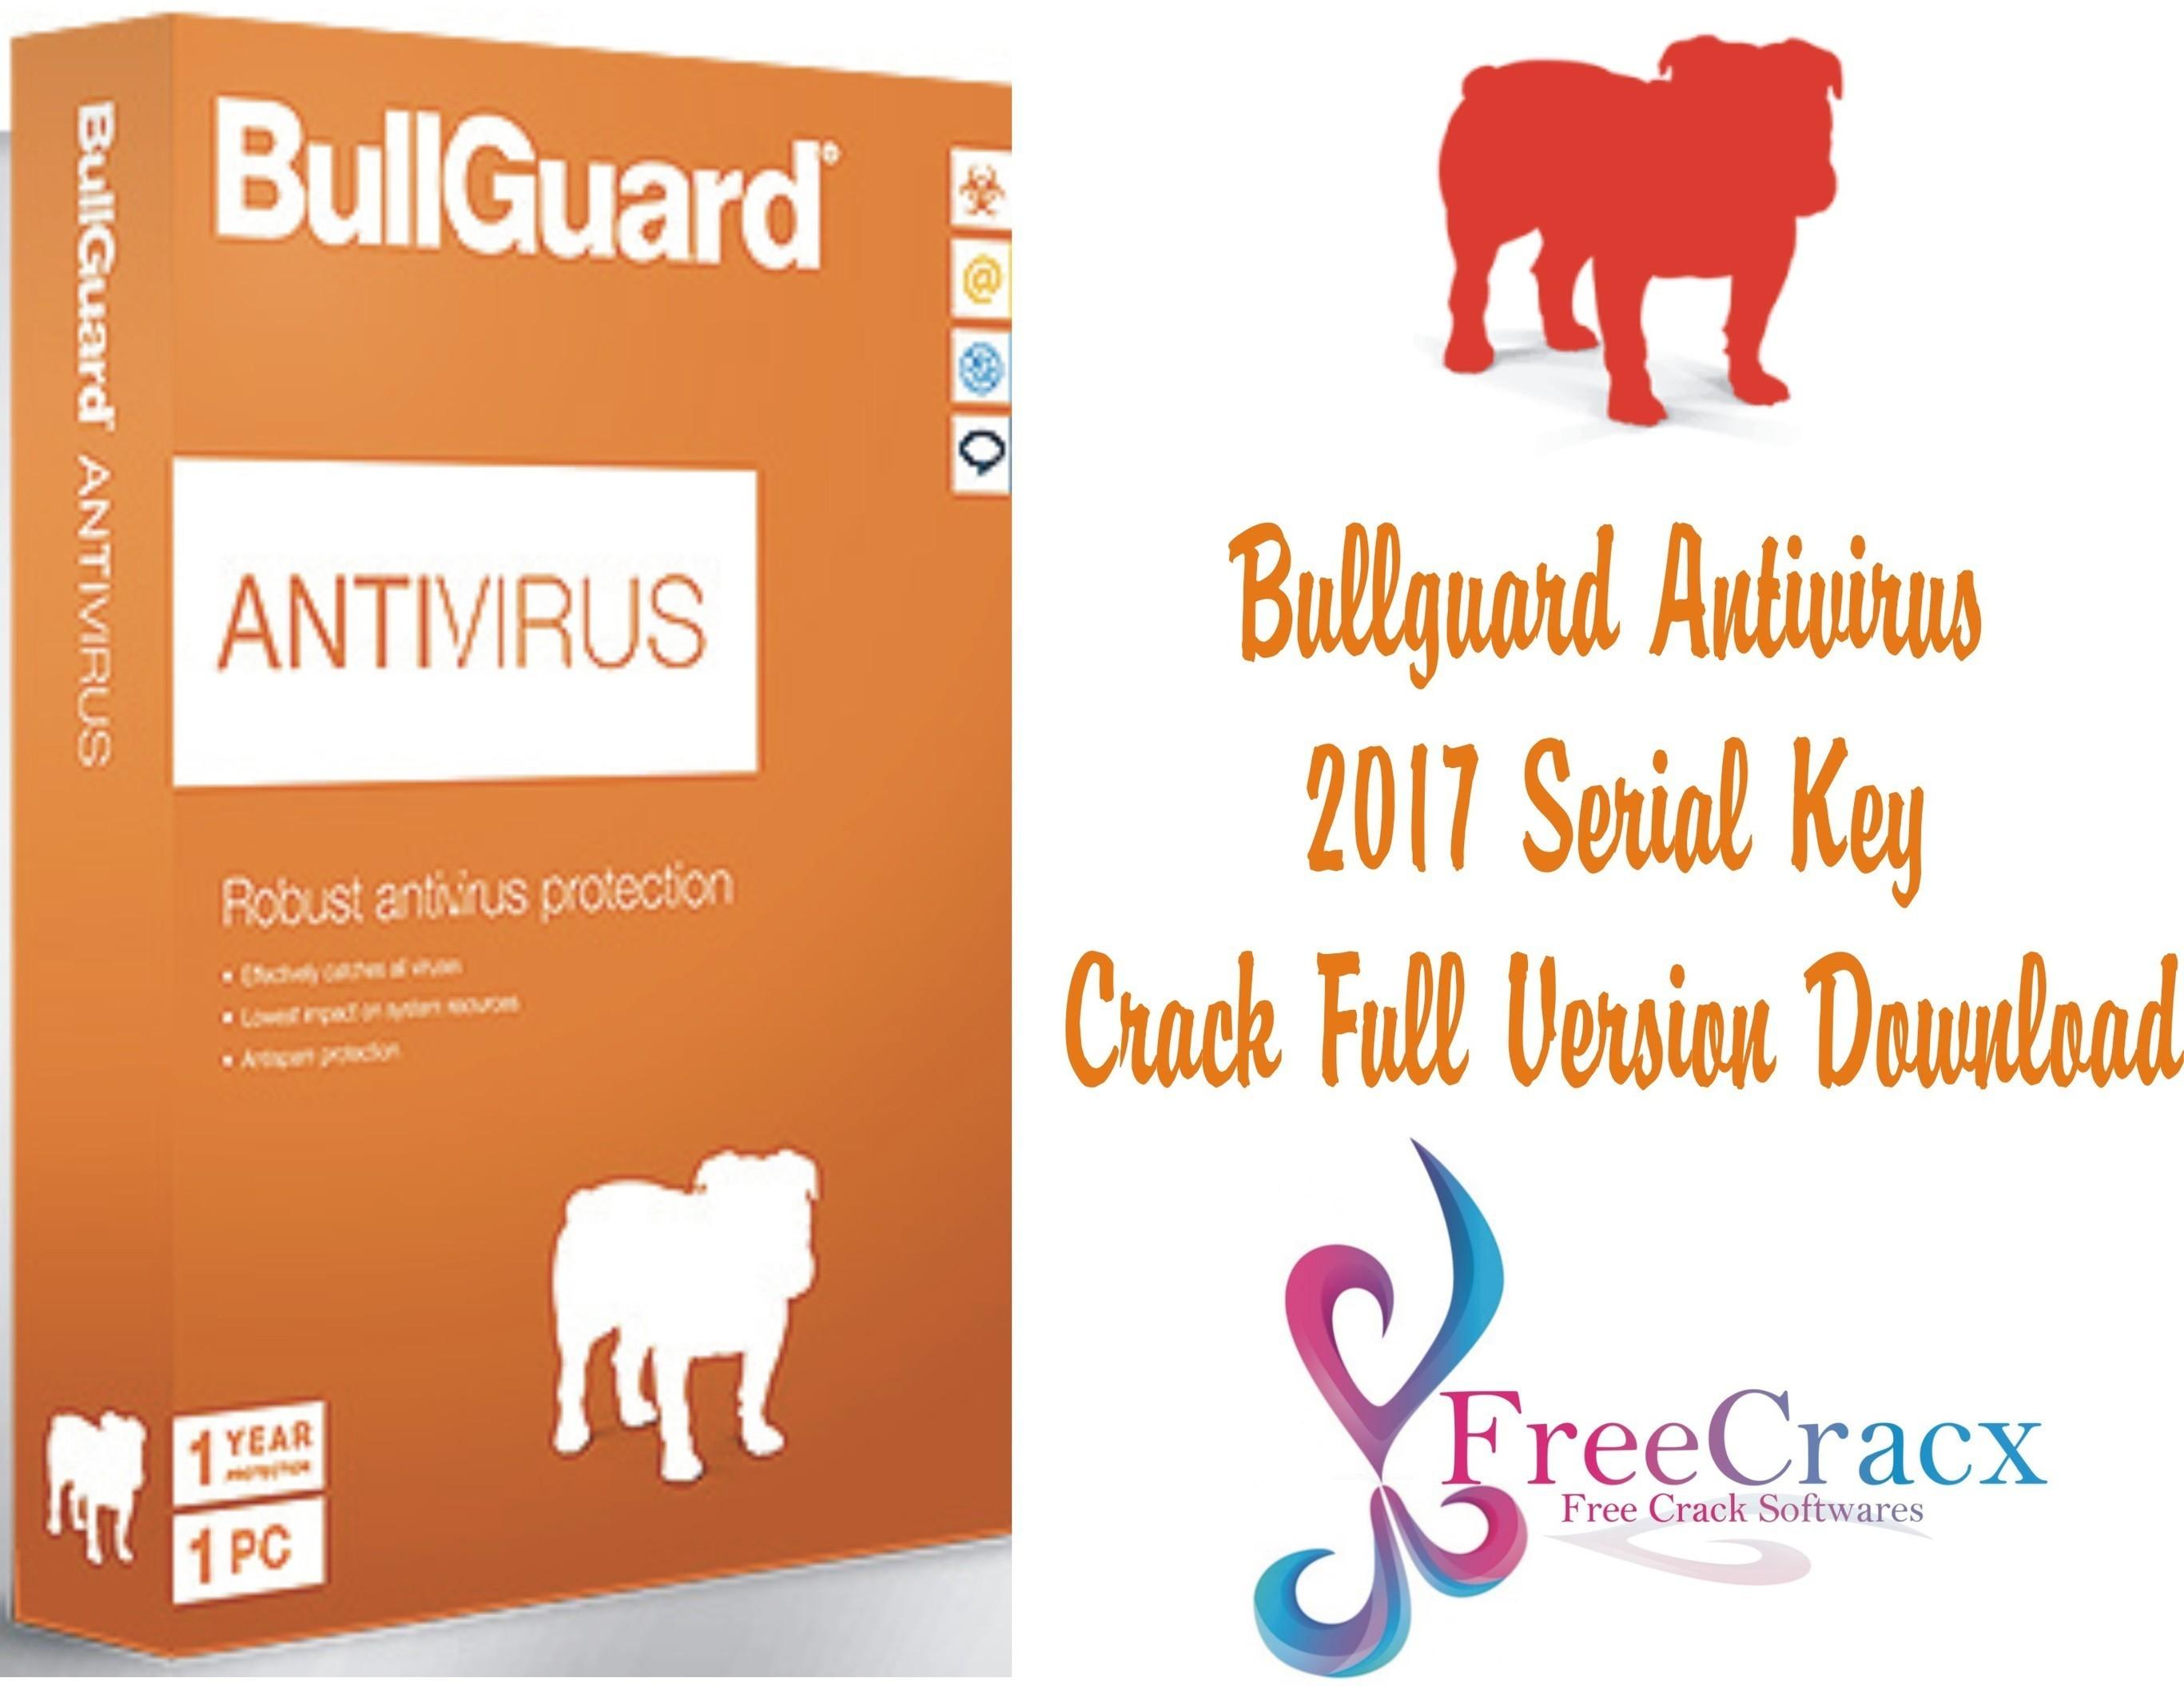 bullguard antivirus free license key